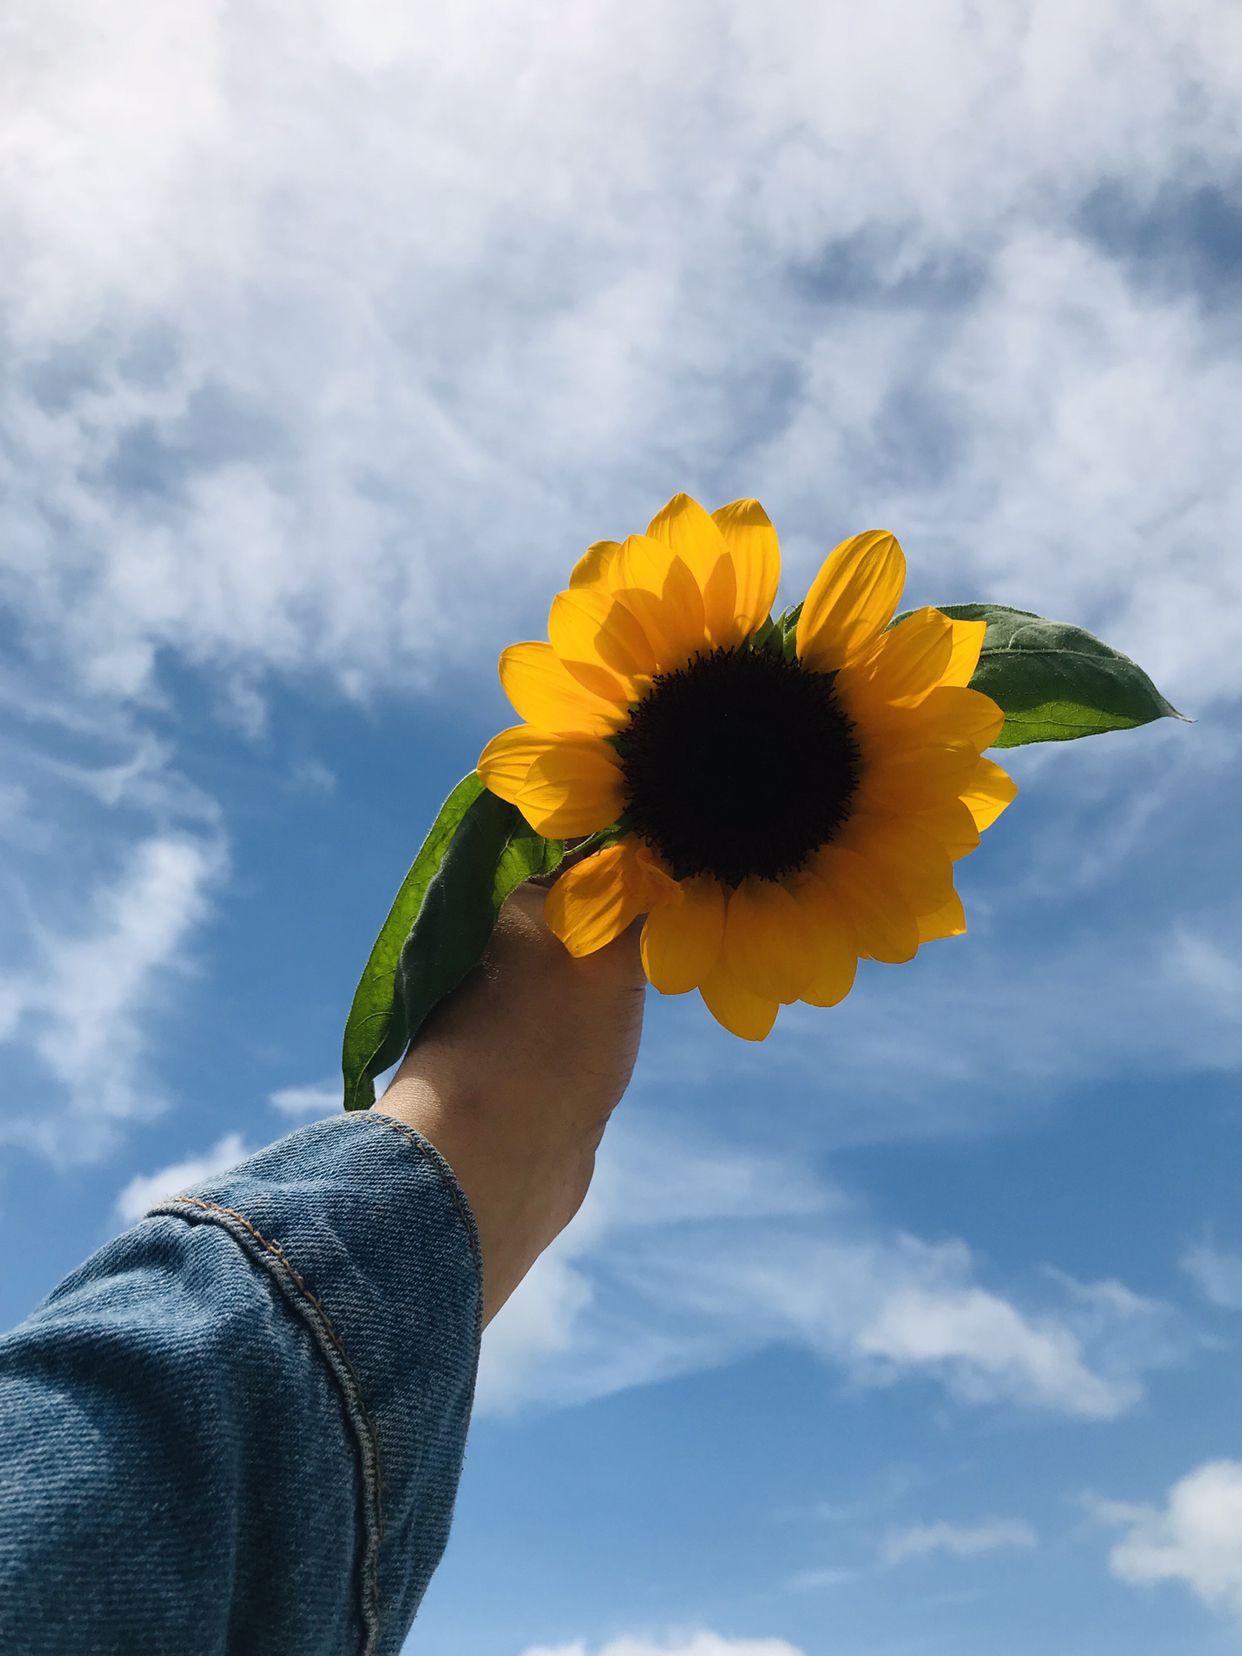 Sunflower Aesthetic Fotografi Fotografi Minimalis Fotografi Kreatif